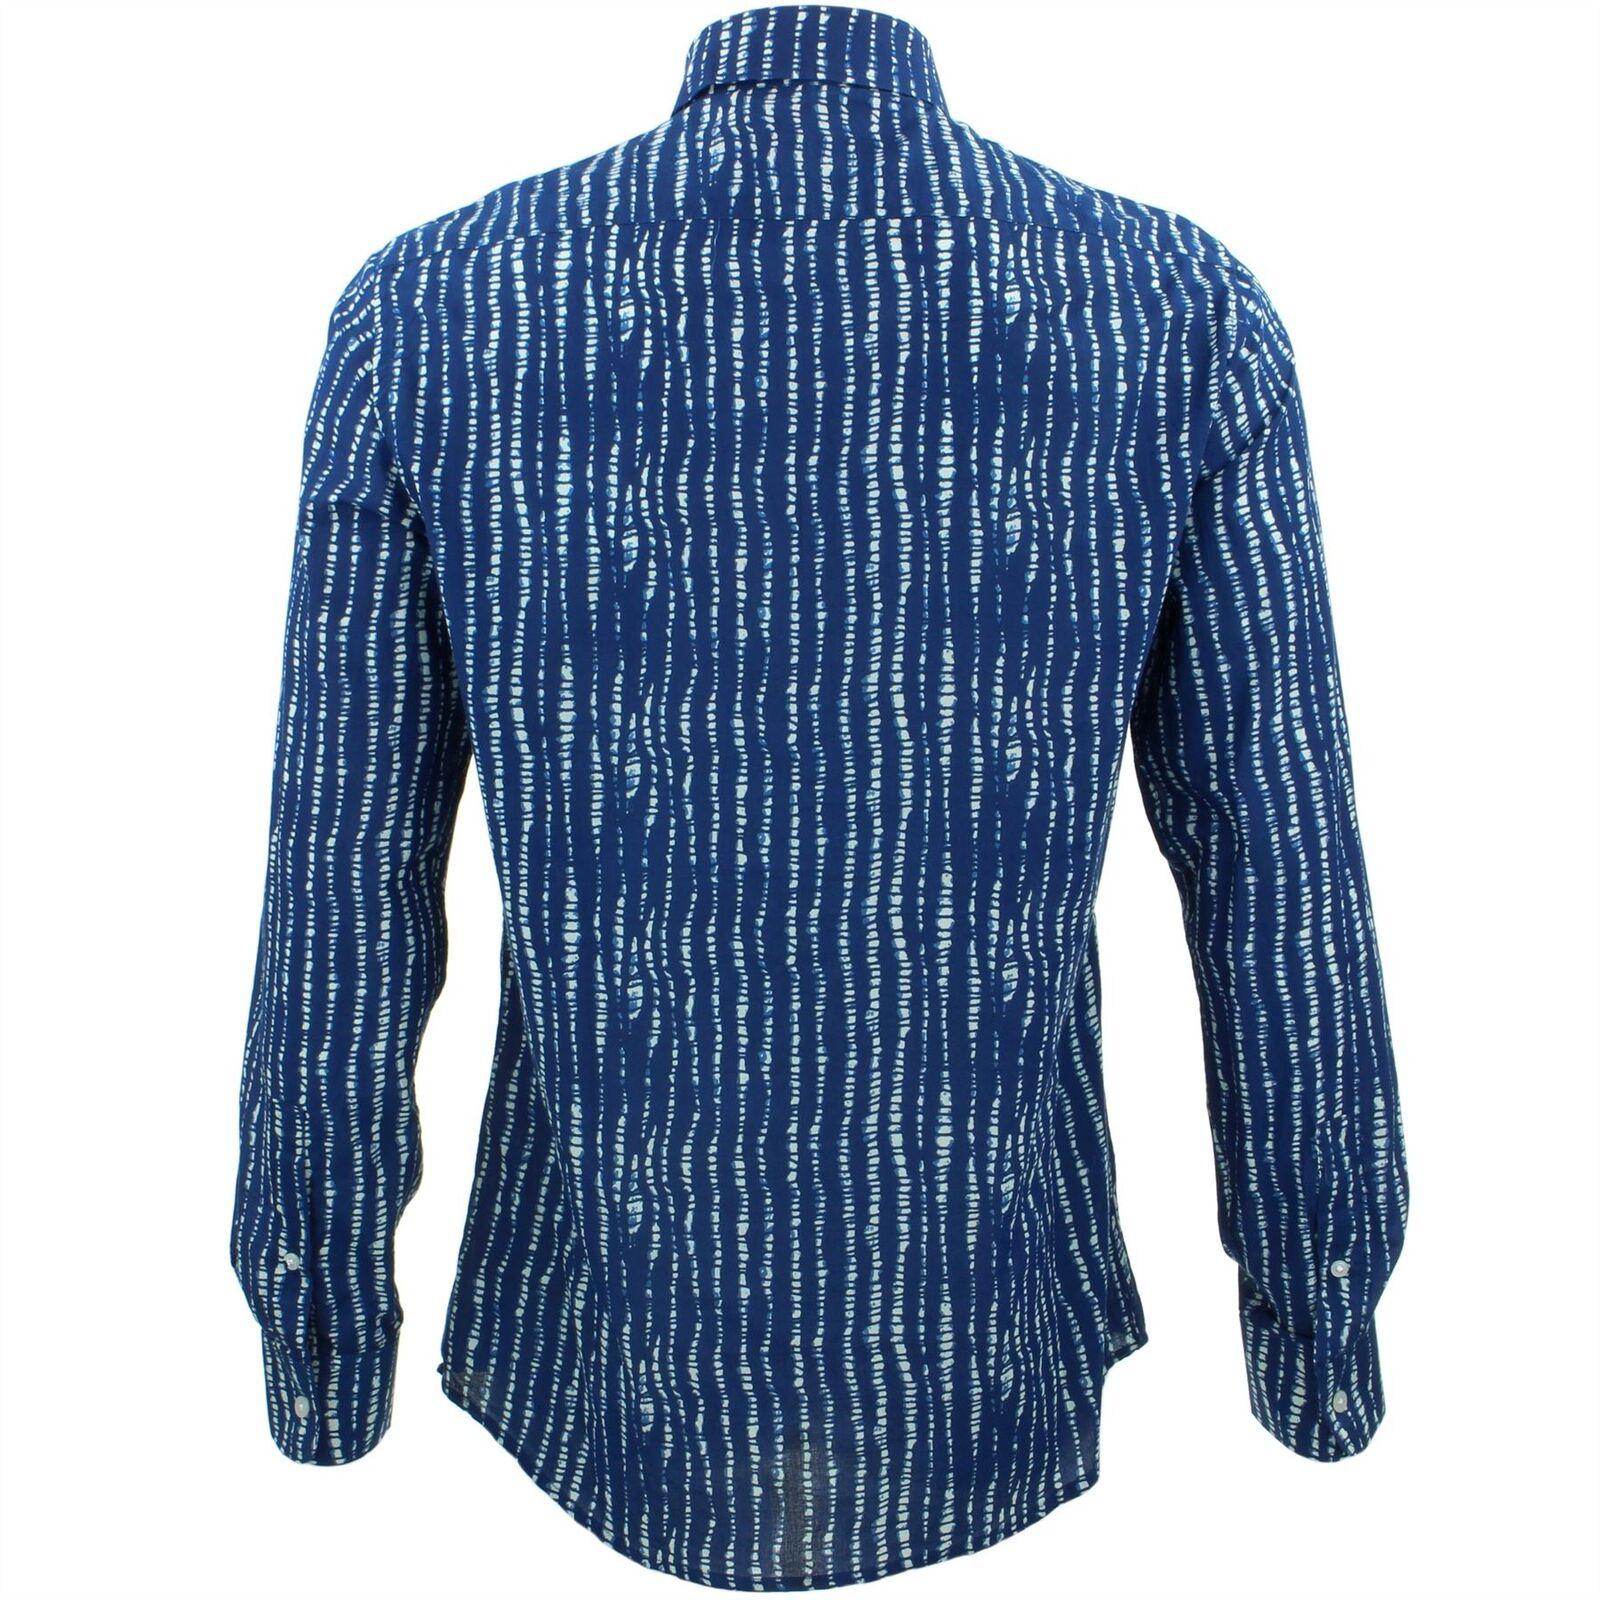 Mens Shirt Loud Originals TAILGoldt FIT Spine Blau Blau Blau Retro Psychedelic Fancy | Große Auswahl  | Spielzeugwelt, fröhlicher Ozean  | Viele Stile  de1ba8